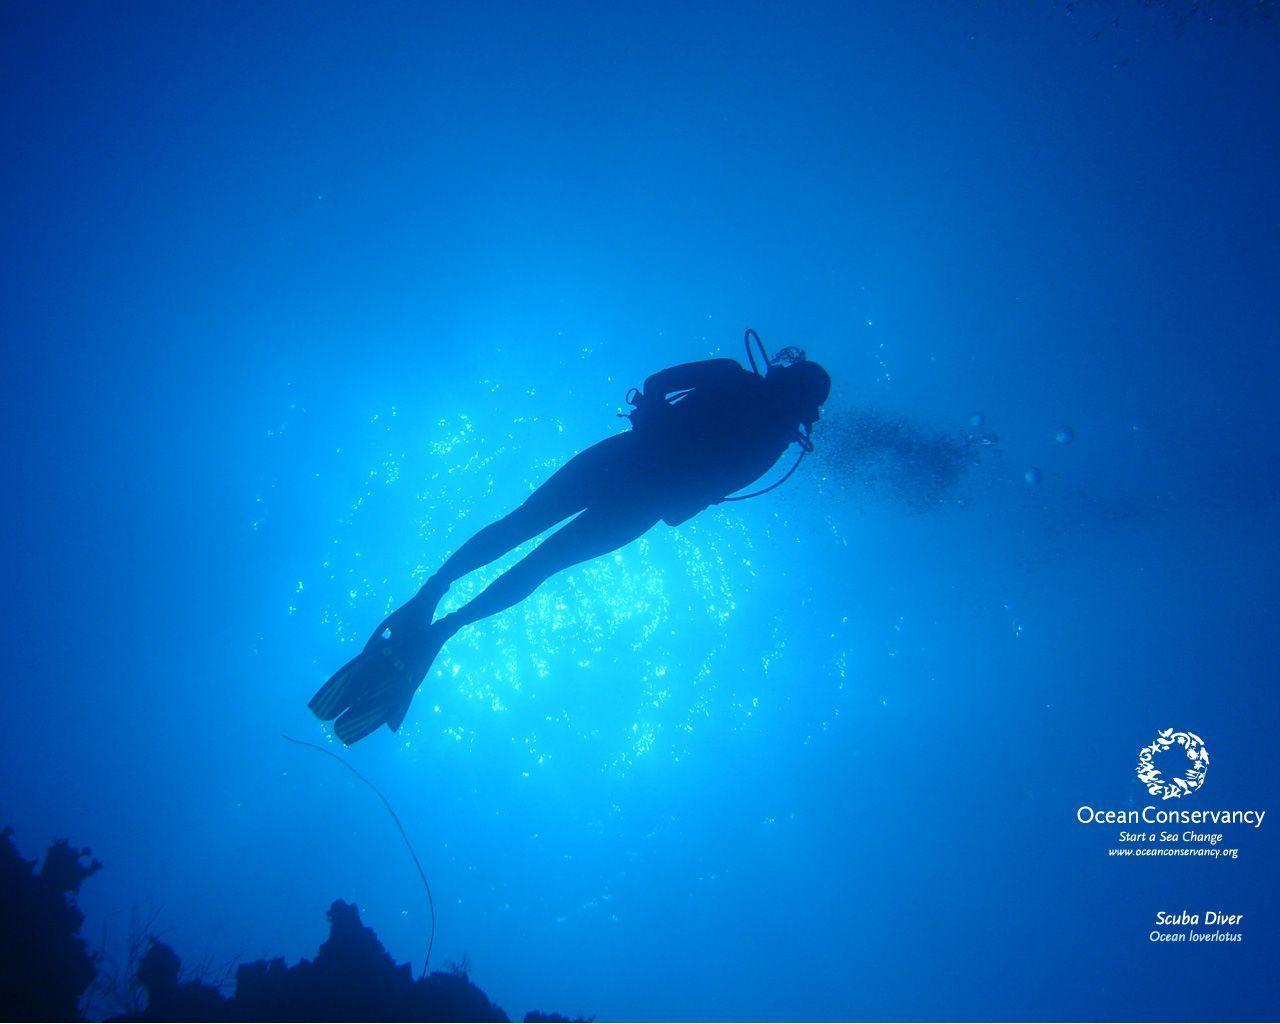 scuba diving wallpaper wallpapers - photo #14